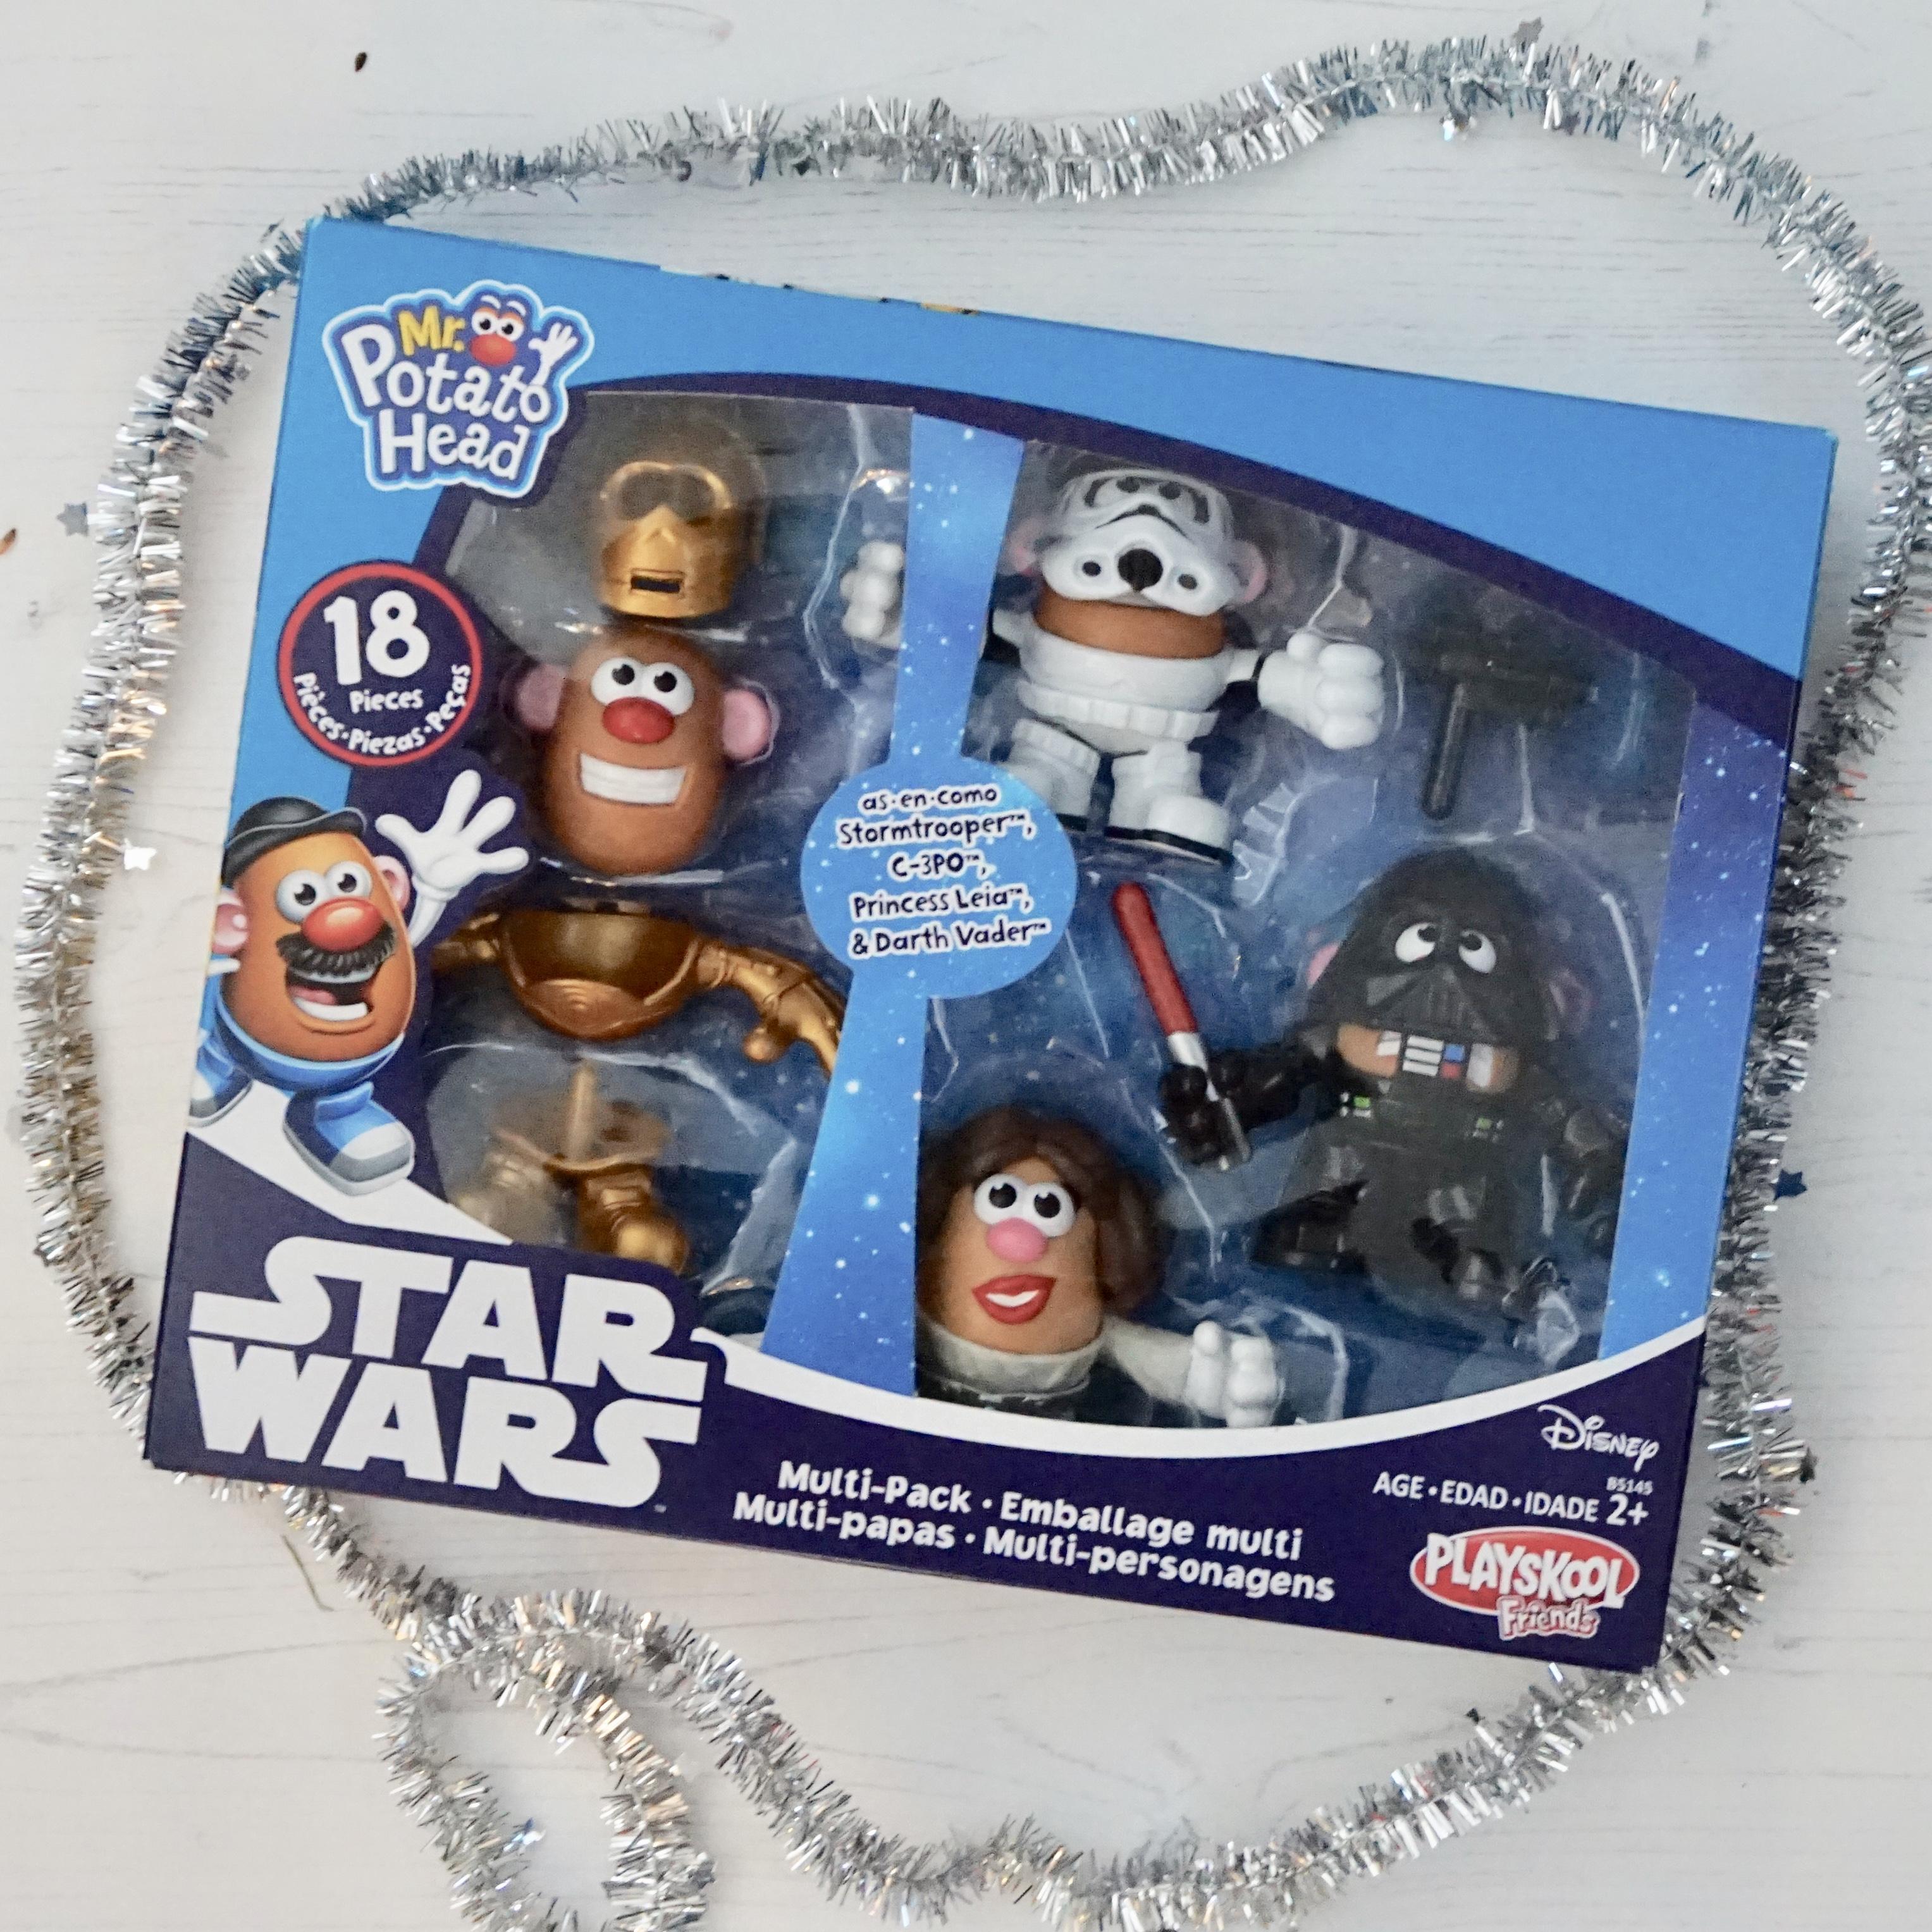 Christmas gifts Star Wars potato heads